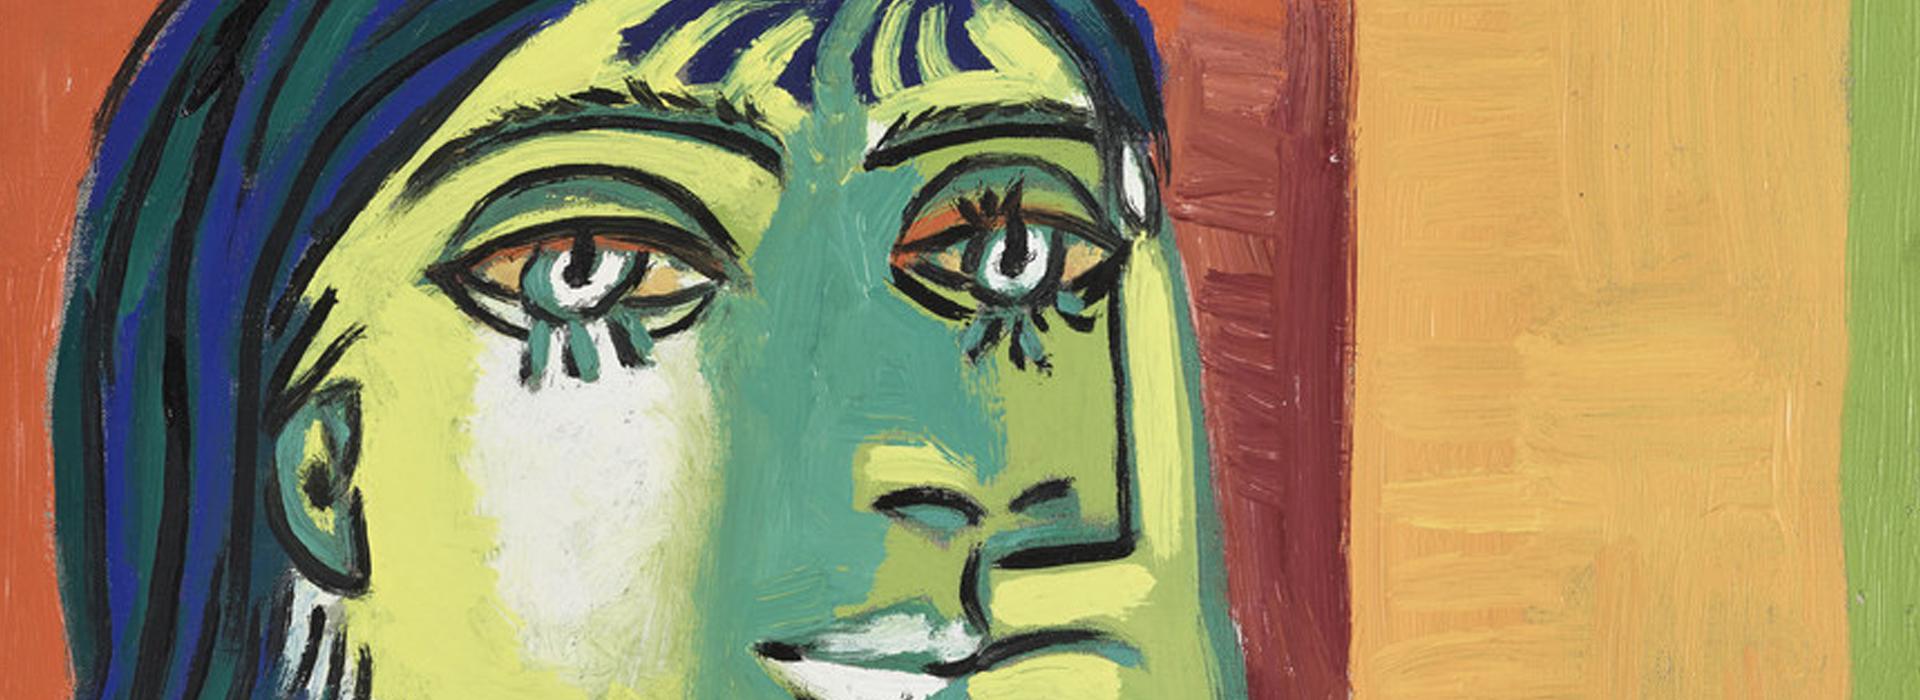 Picasso. Figures